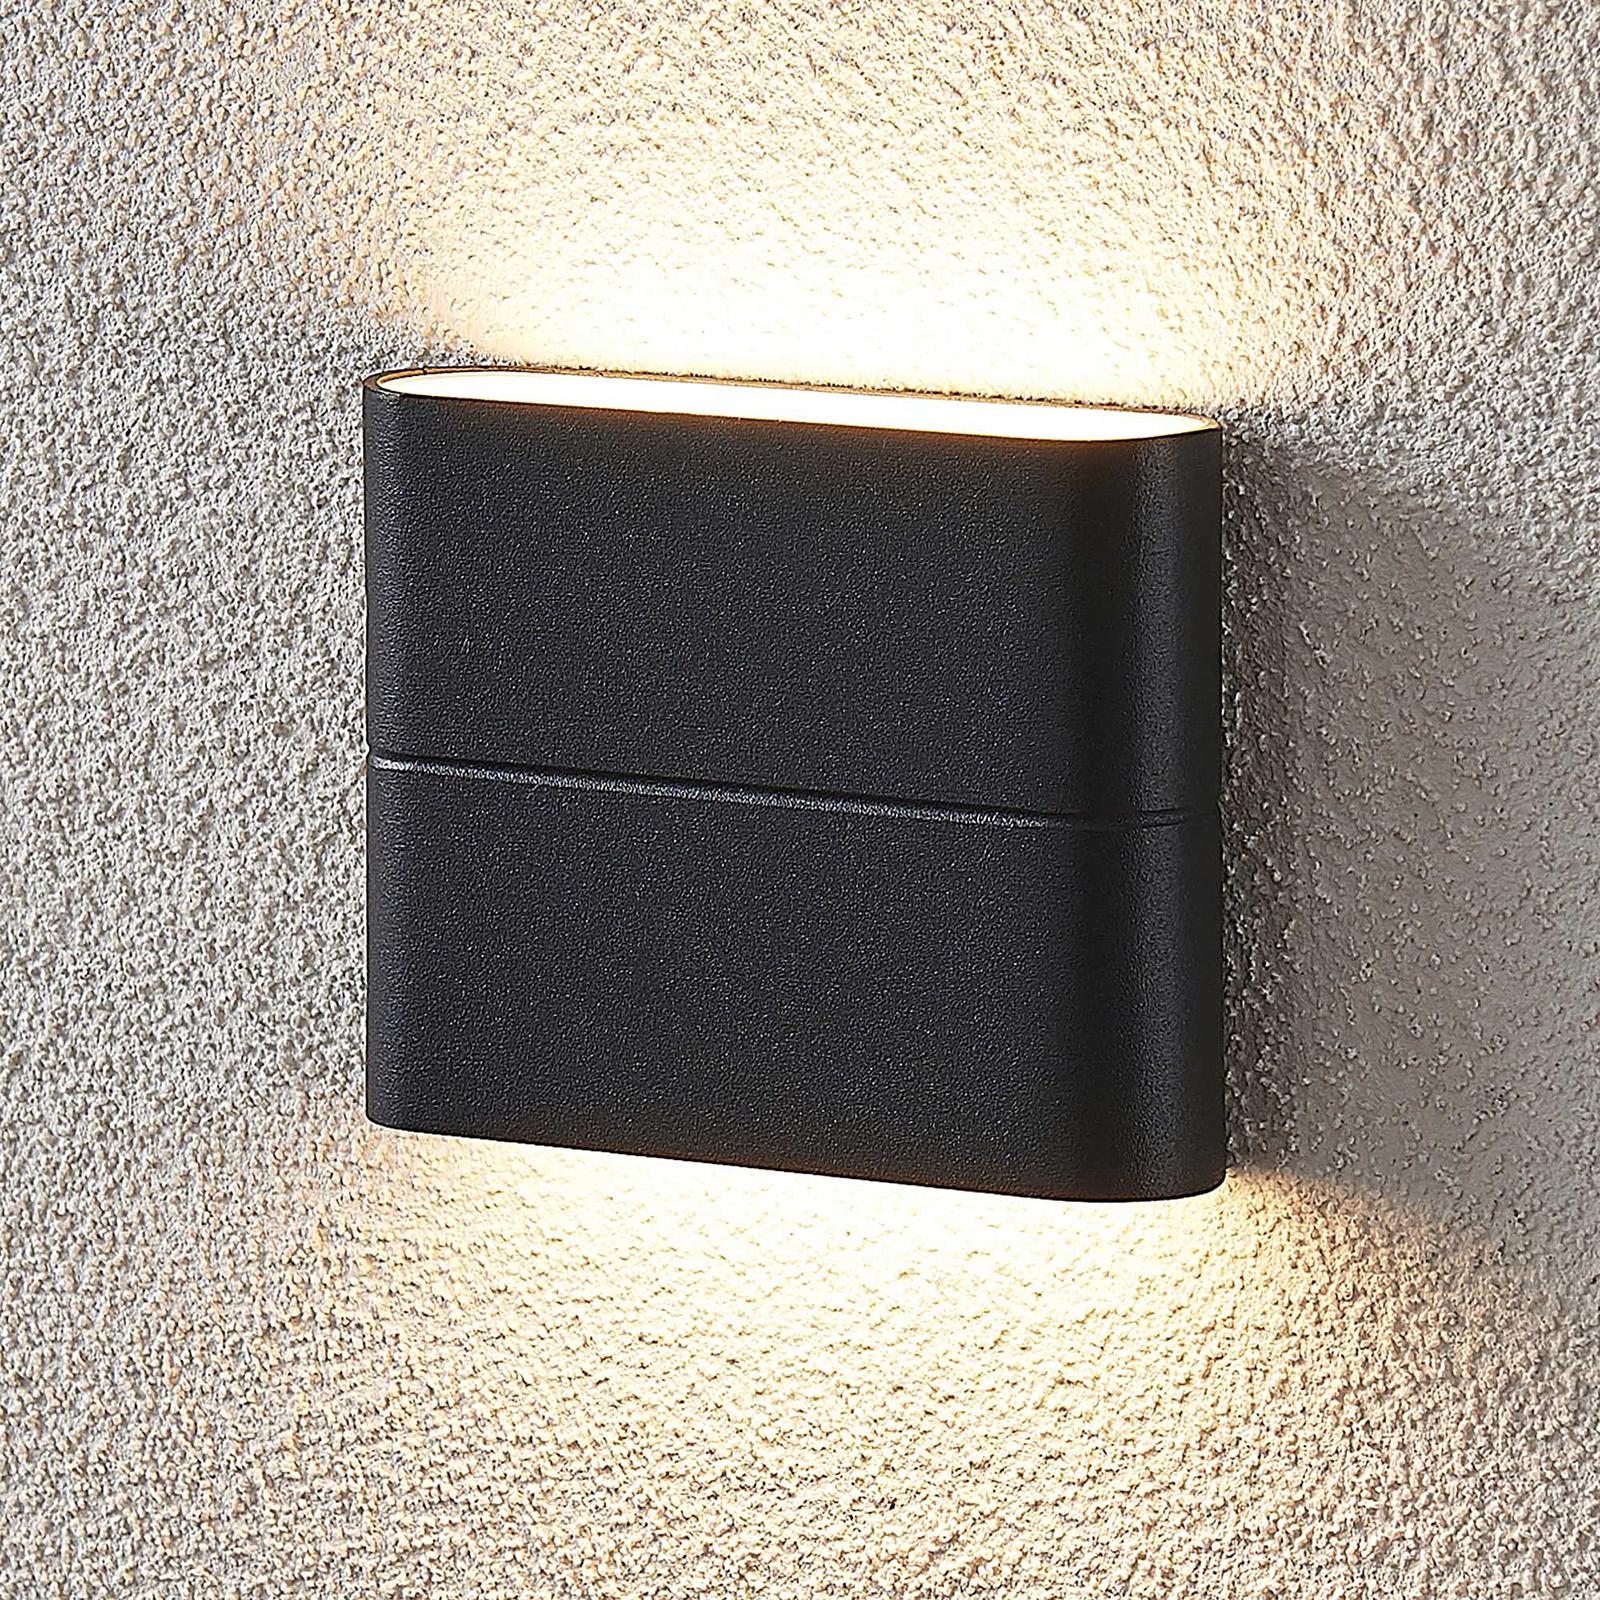 LED-Außenwandleuchte Salka, dunkelgrau, 11,5 cm